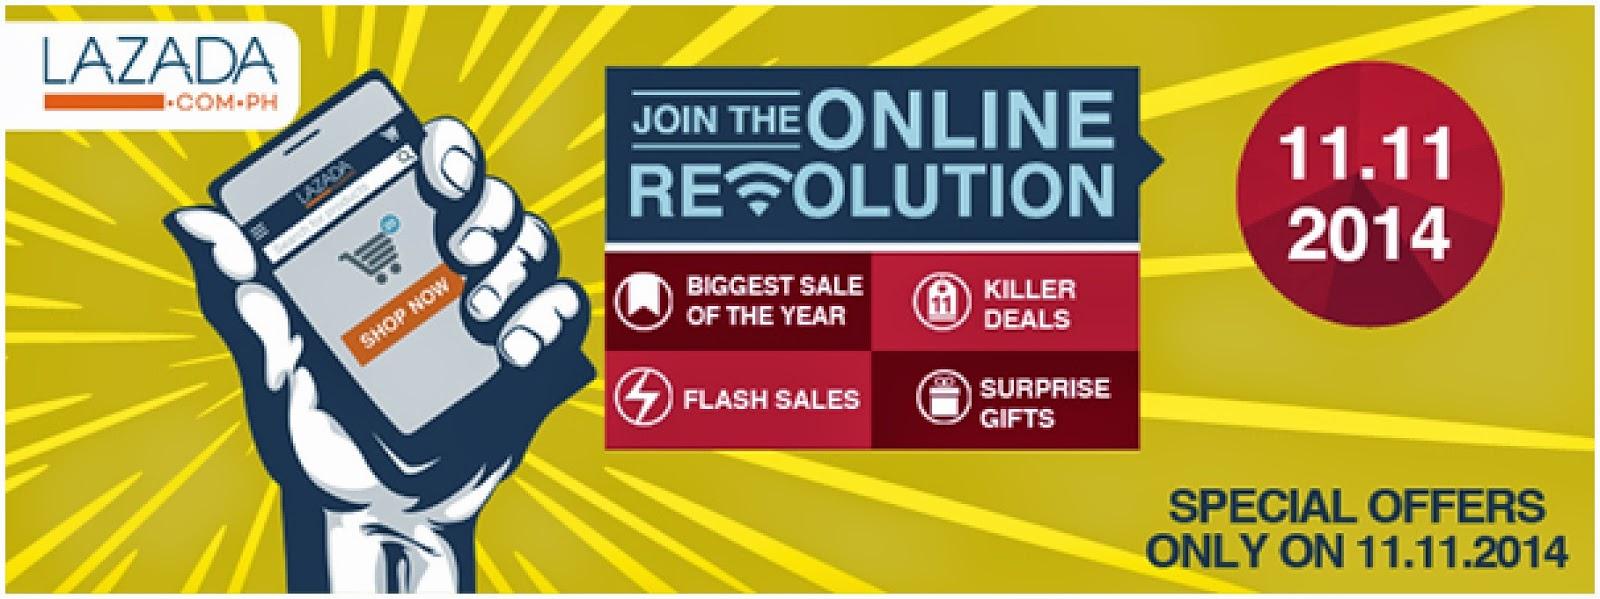 Lazada Online Revolution 2014